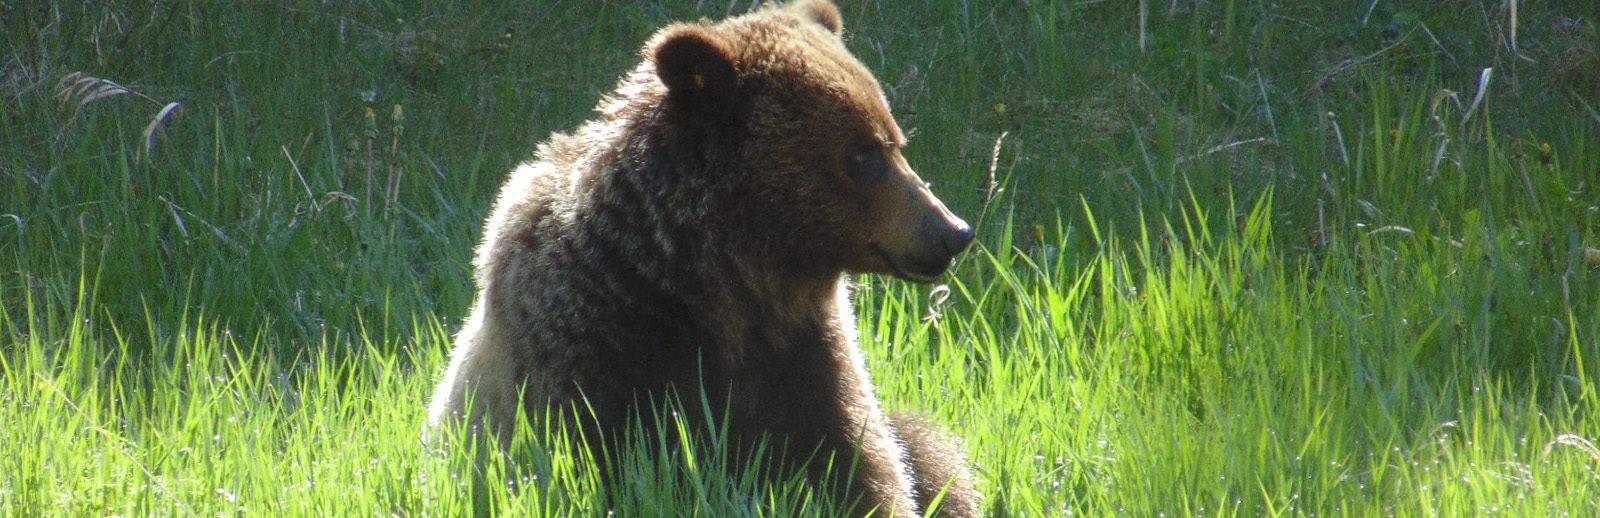 Grizzly Bear - Kananaskis Country